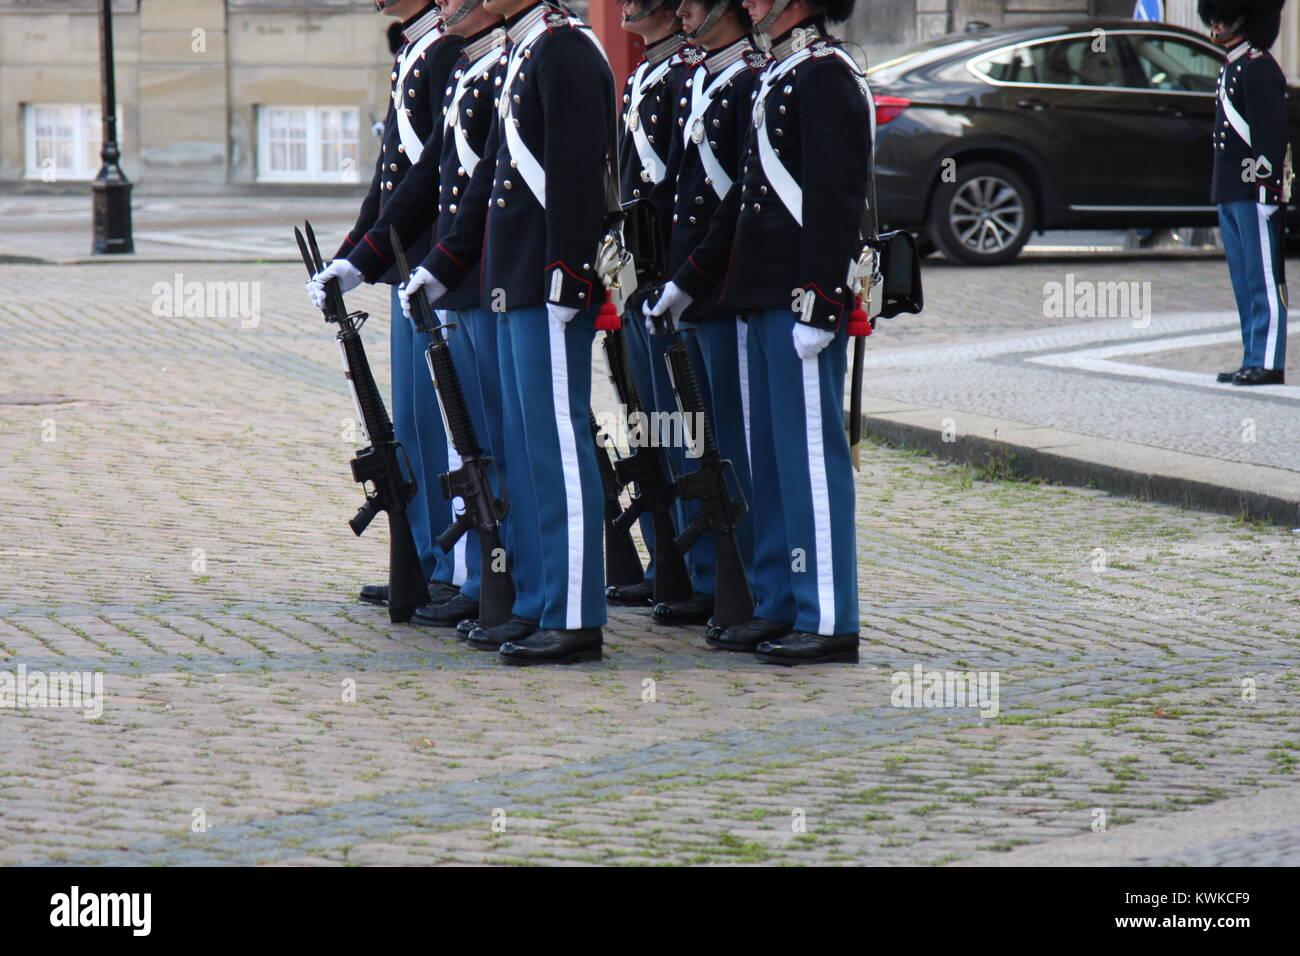 Royal guard on Amalienborg Palace Square in Copenhagen, Denmark - Stock Image